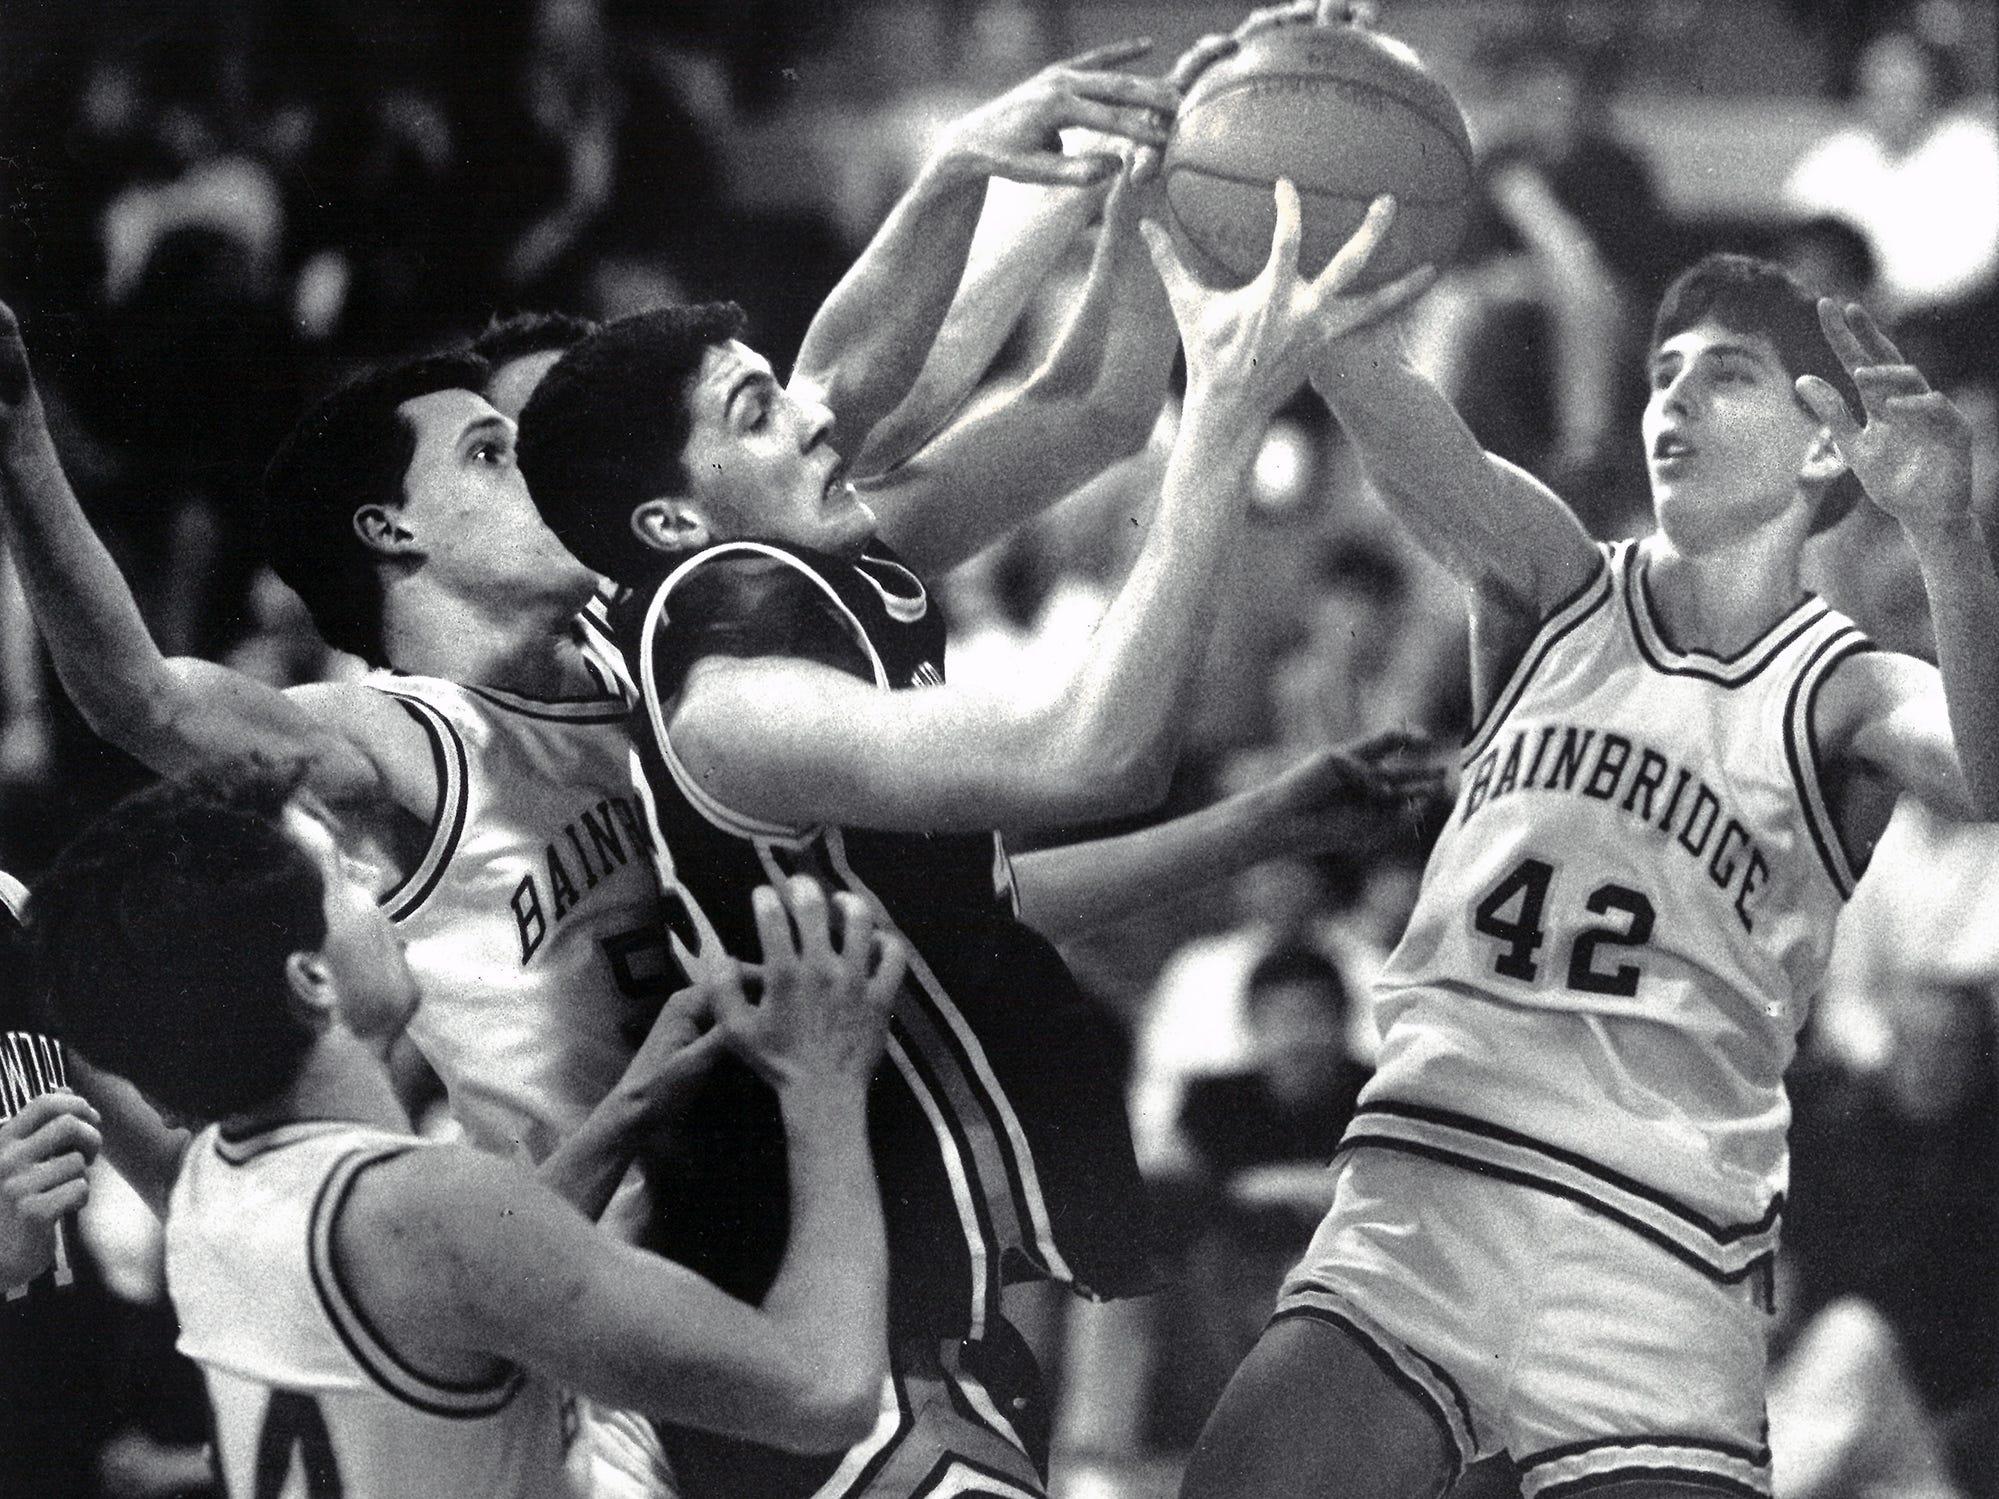 01/24/90Bainbridge Basketball